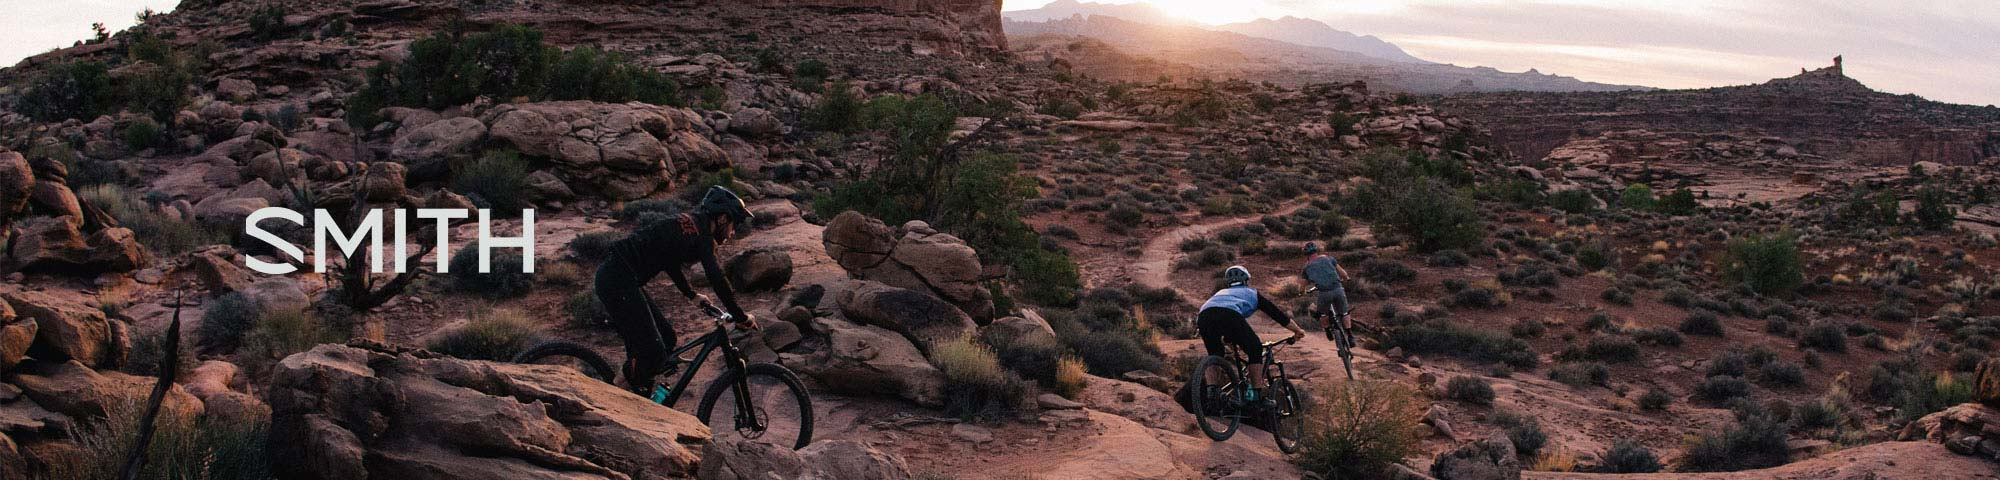 Smith Forefront 2 MIPS Mountain Bike Helmet